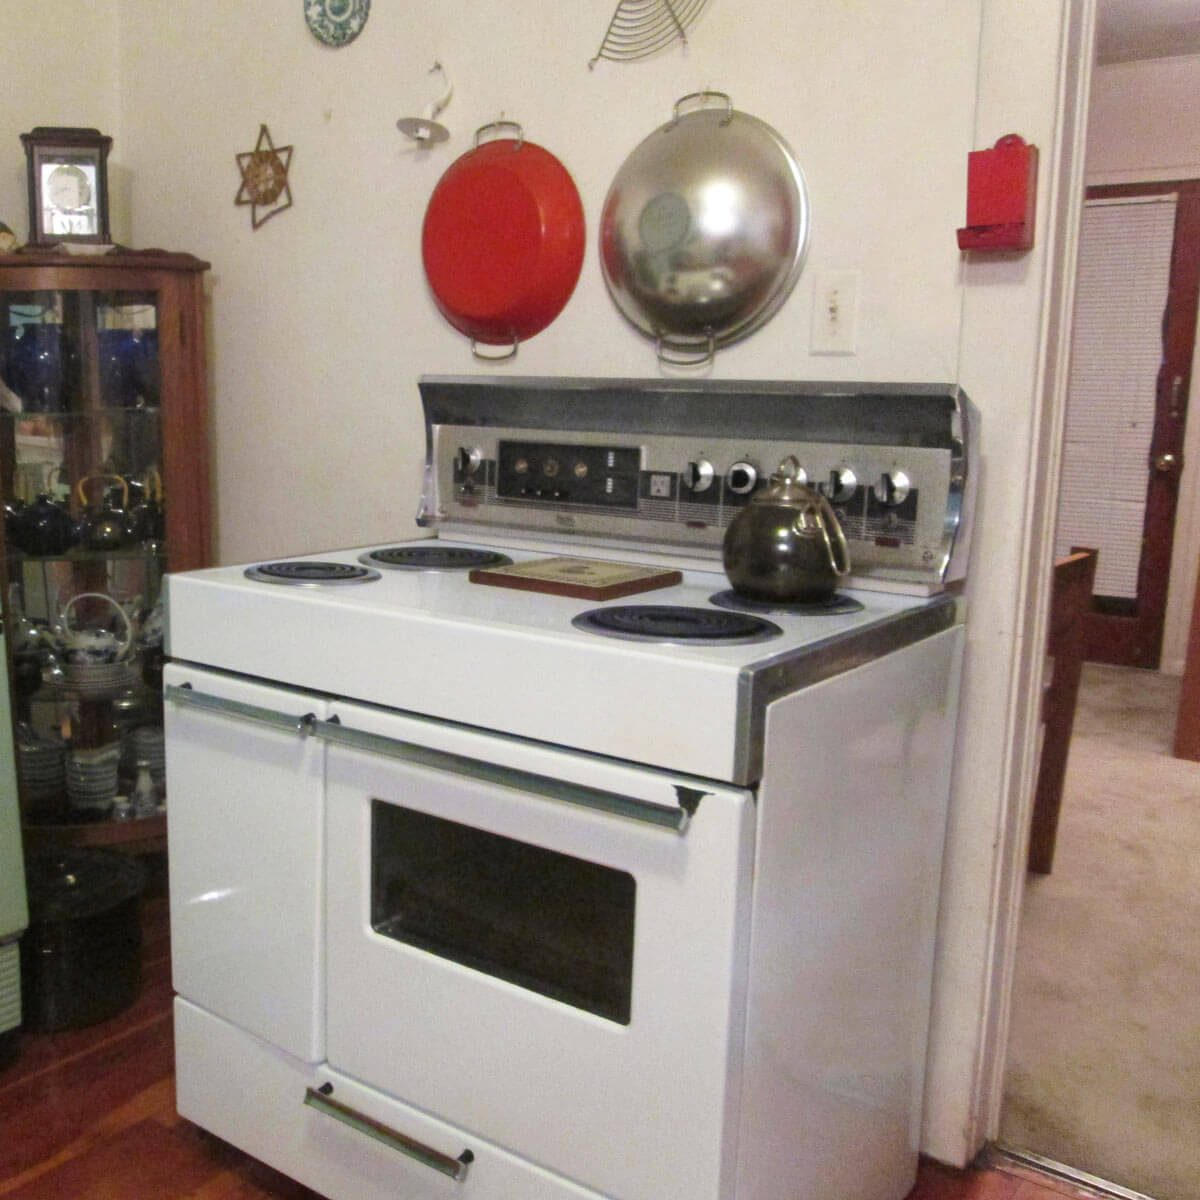 18_02_CherTom3_REXMay17 vintage white stove oven